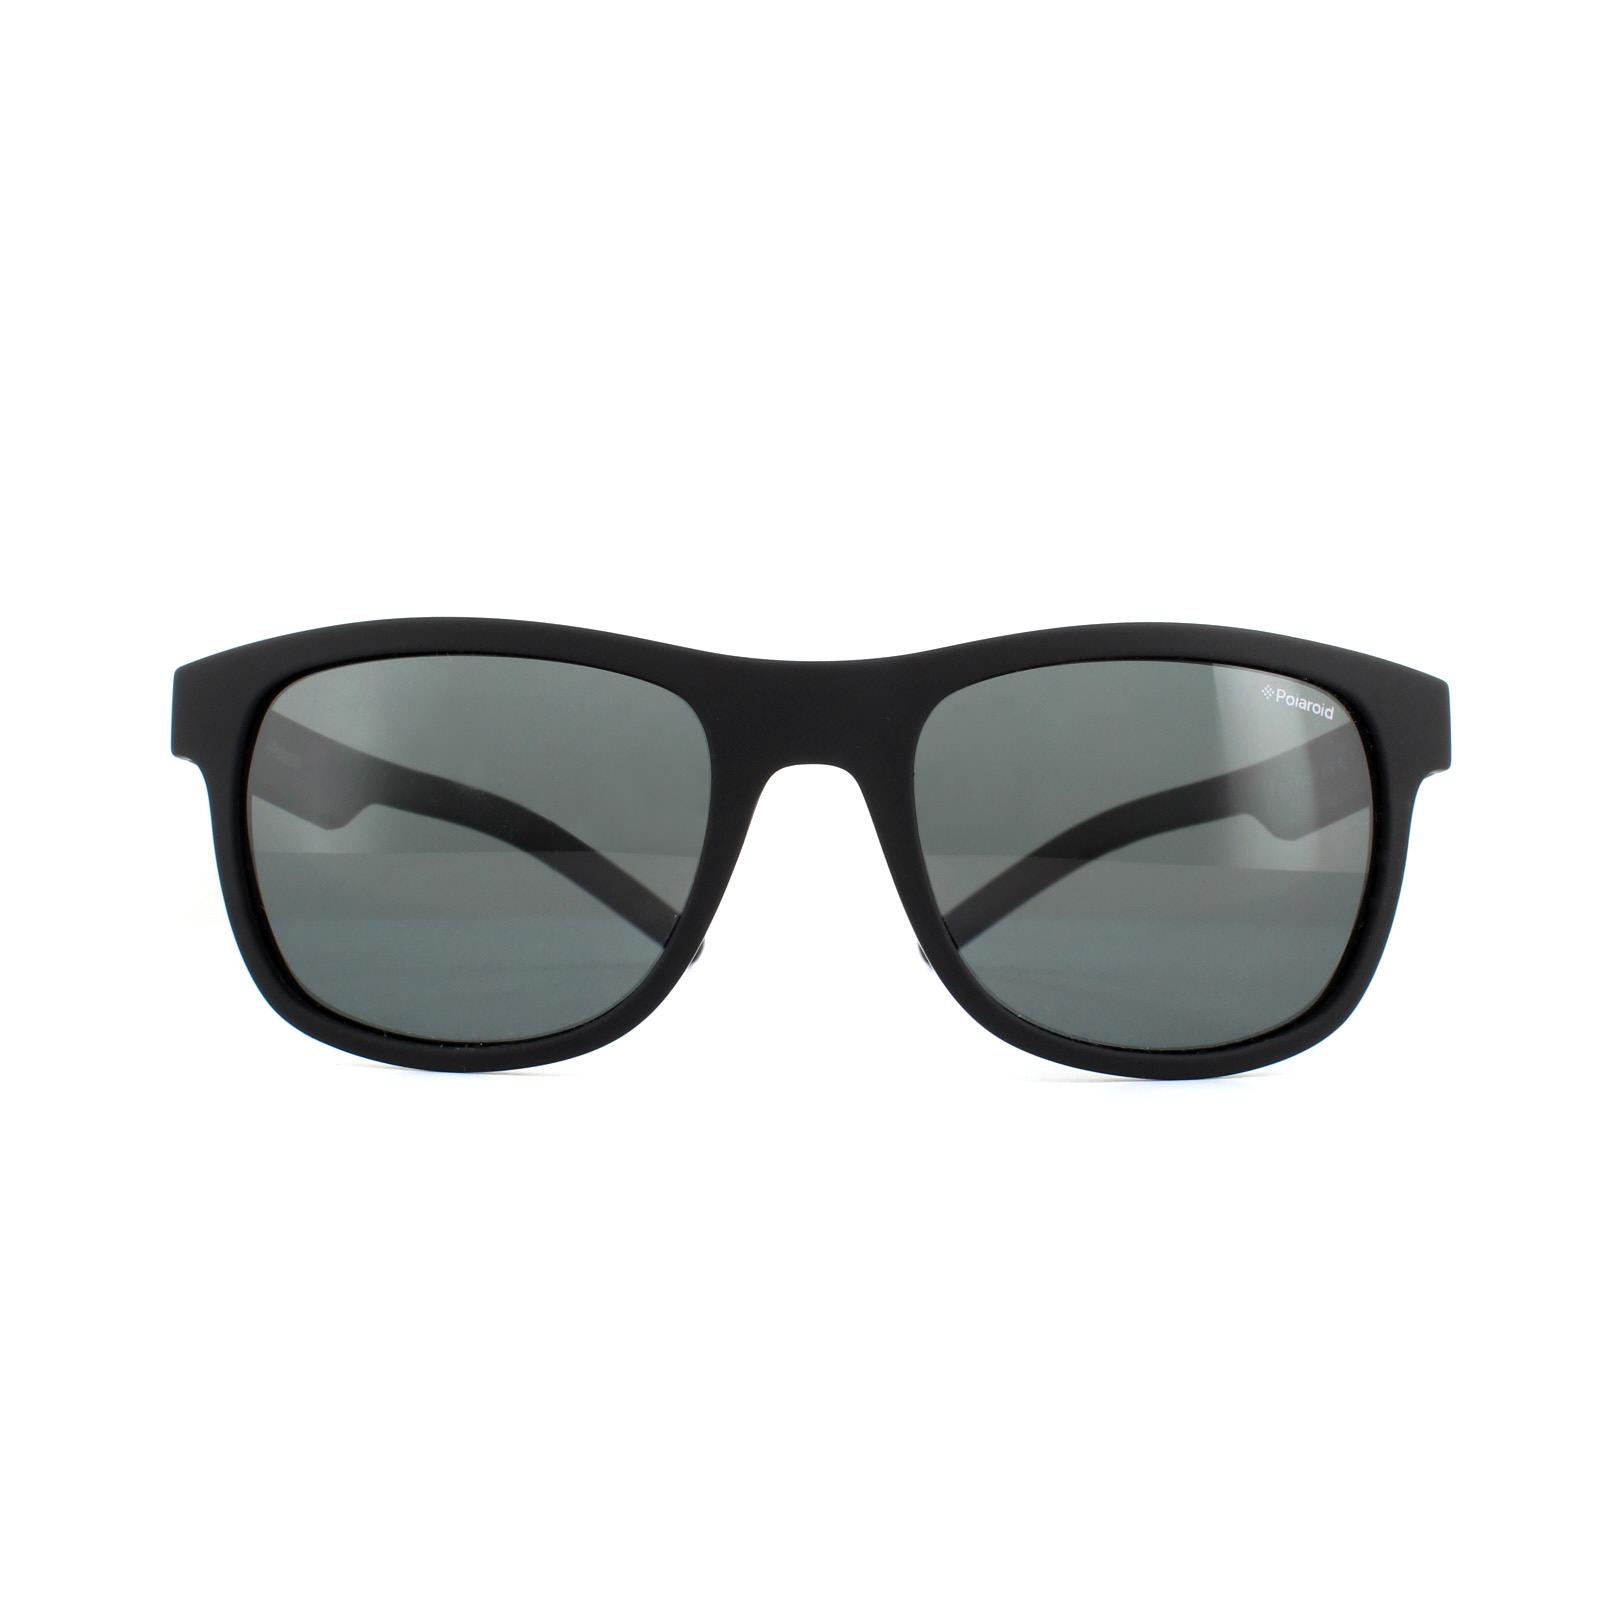 cbfafca40a Sentinel Polaroid Sunglasses PLD 6015 S YYV Y2 Rubber Black Grey Polarized